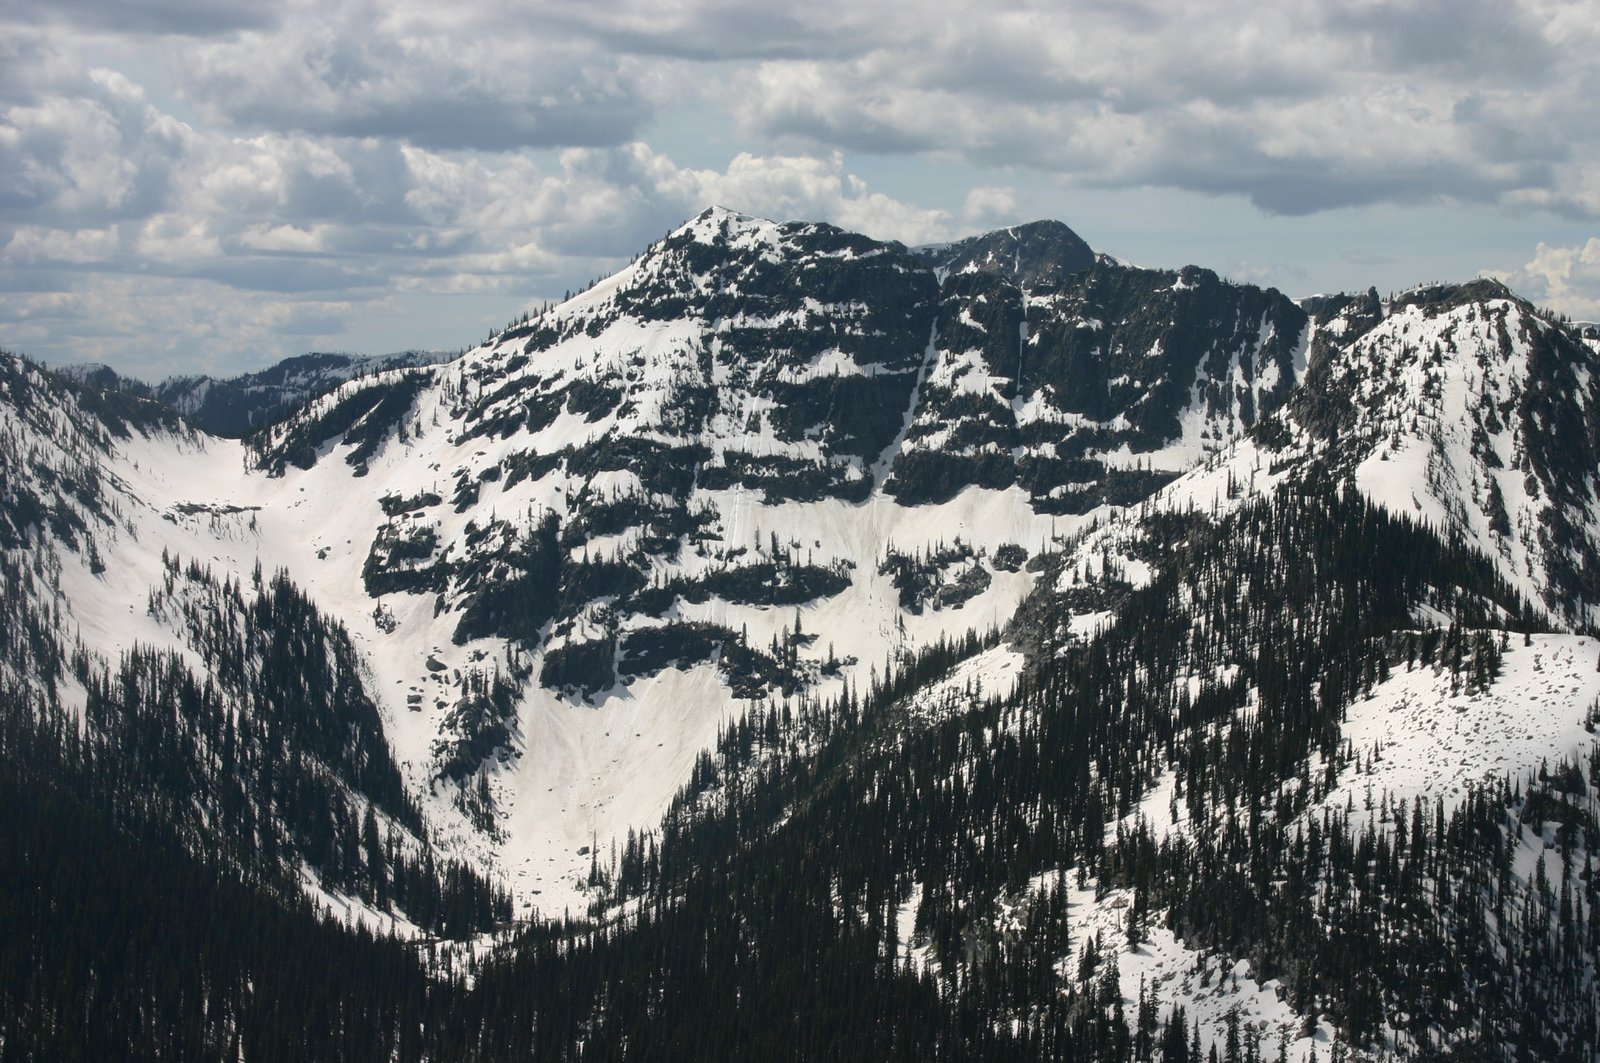 Kootenay Pass, B.C Backcountry